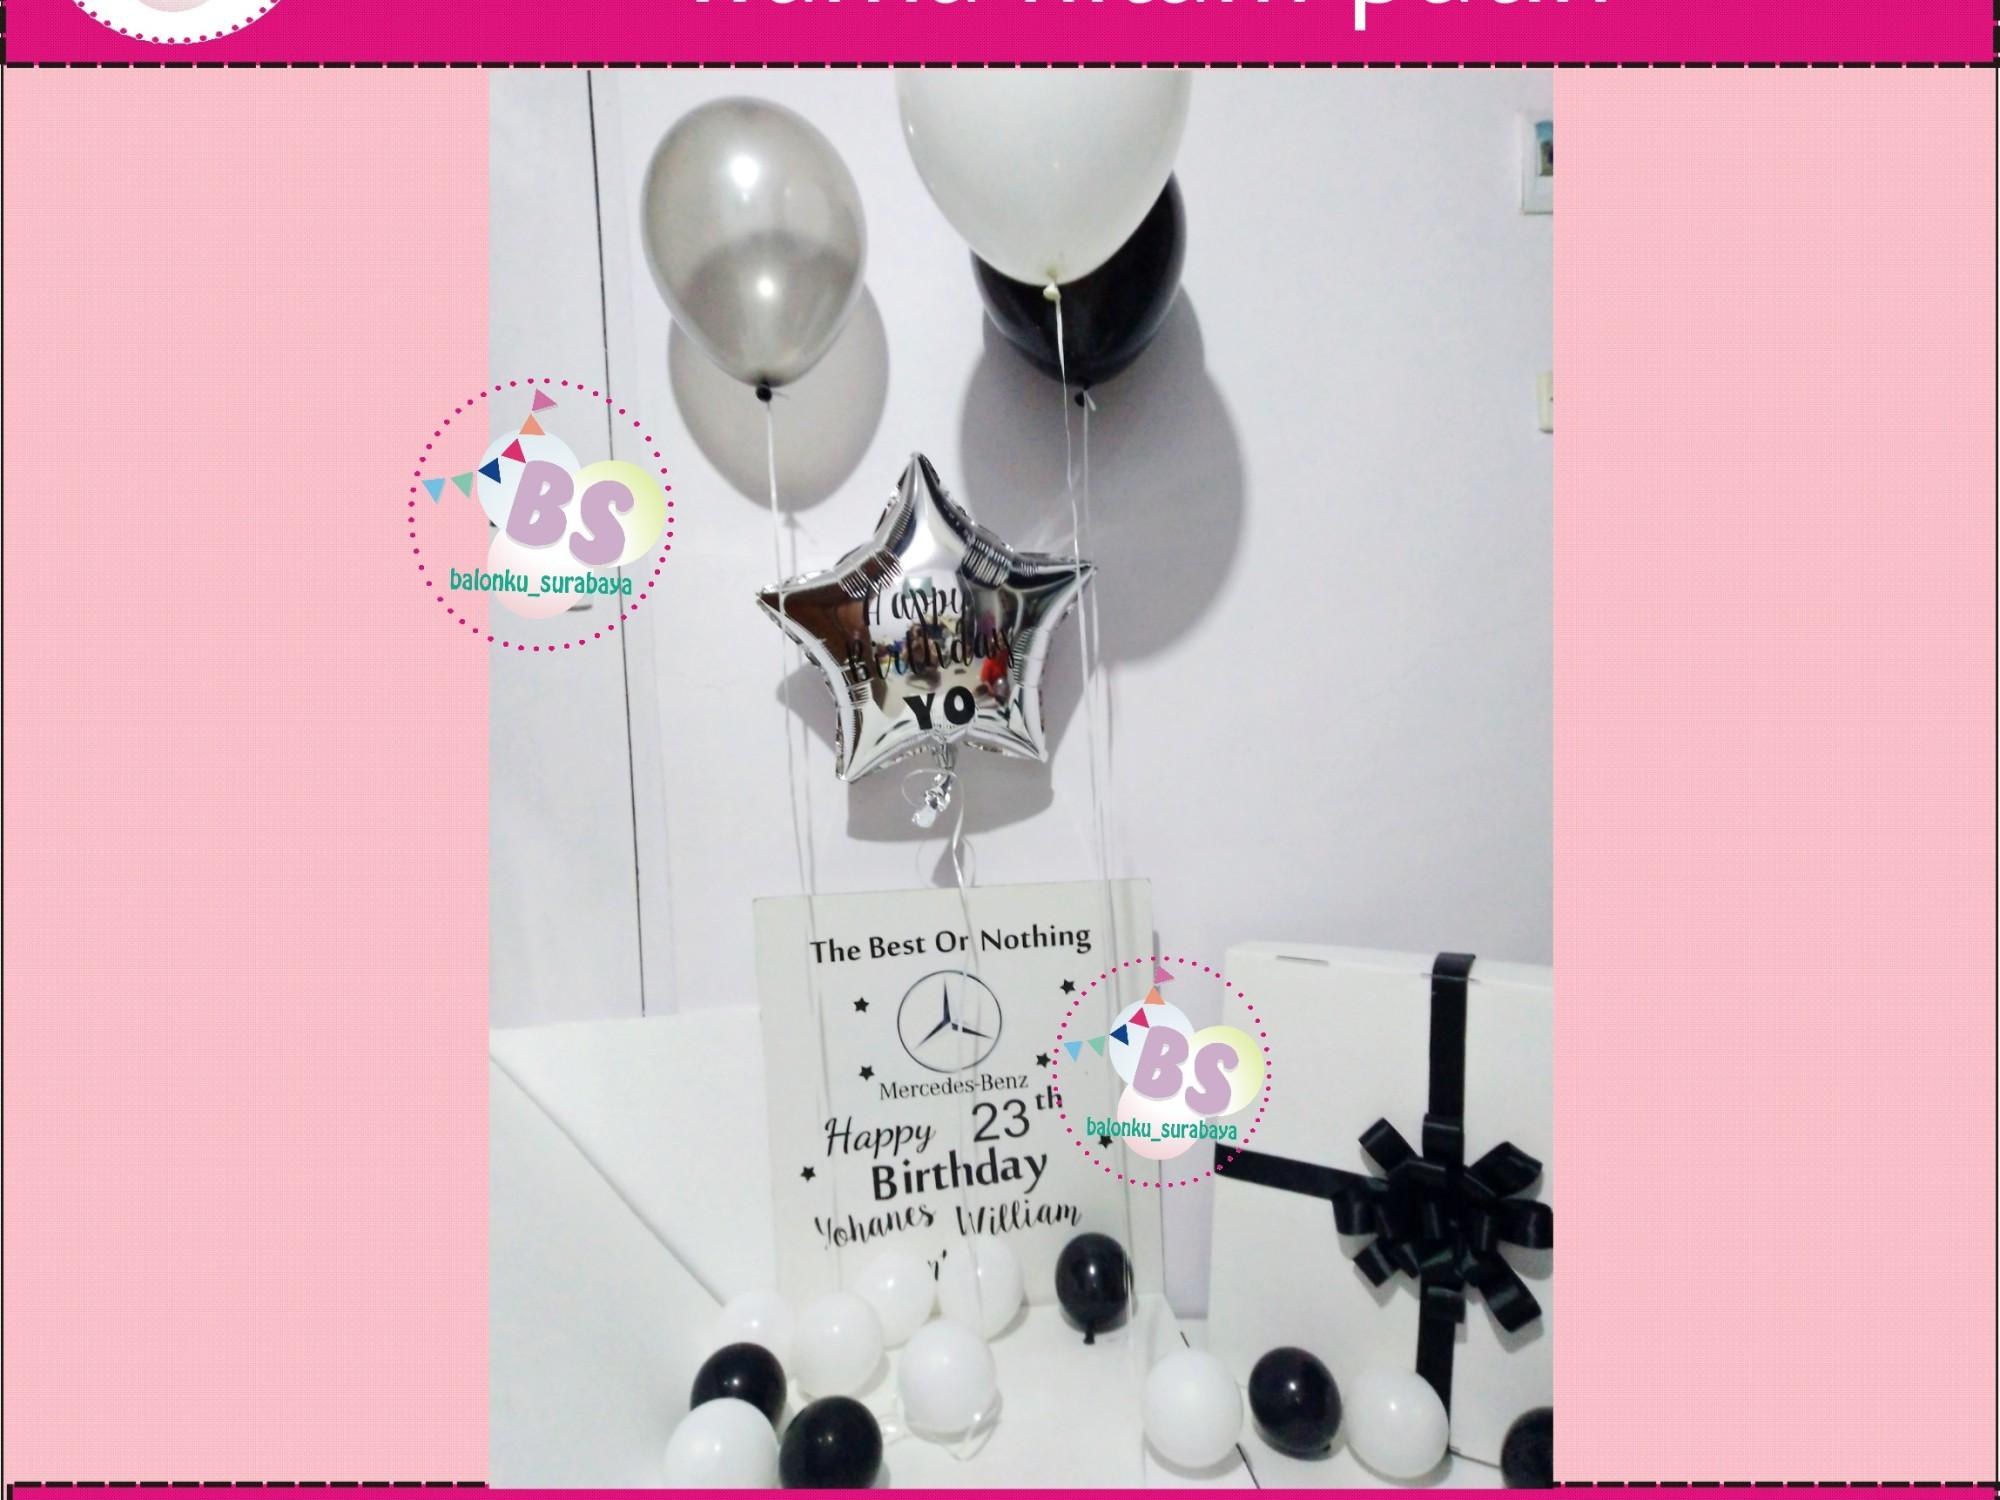 Surprise box Surabaya, BAlon Gas,Bunga dekorasi,Rangkaian bunga artificial, Buket bunga, buket bunga mawar, harga buket bunga,Balon sablon, balon Printing, balon promosi, , Perlengkapan ulang tahun, Balon latex , balon doff, balon latex, balon doff merah, balon natal, balon agustusan, balon dekorasi, balonku Surabaya, 085733133529